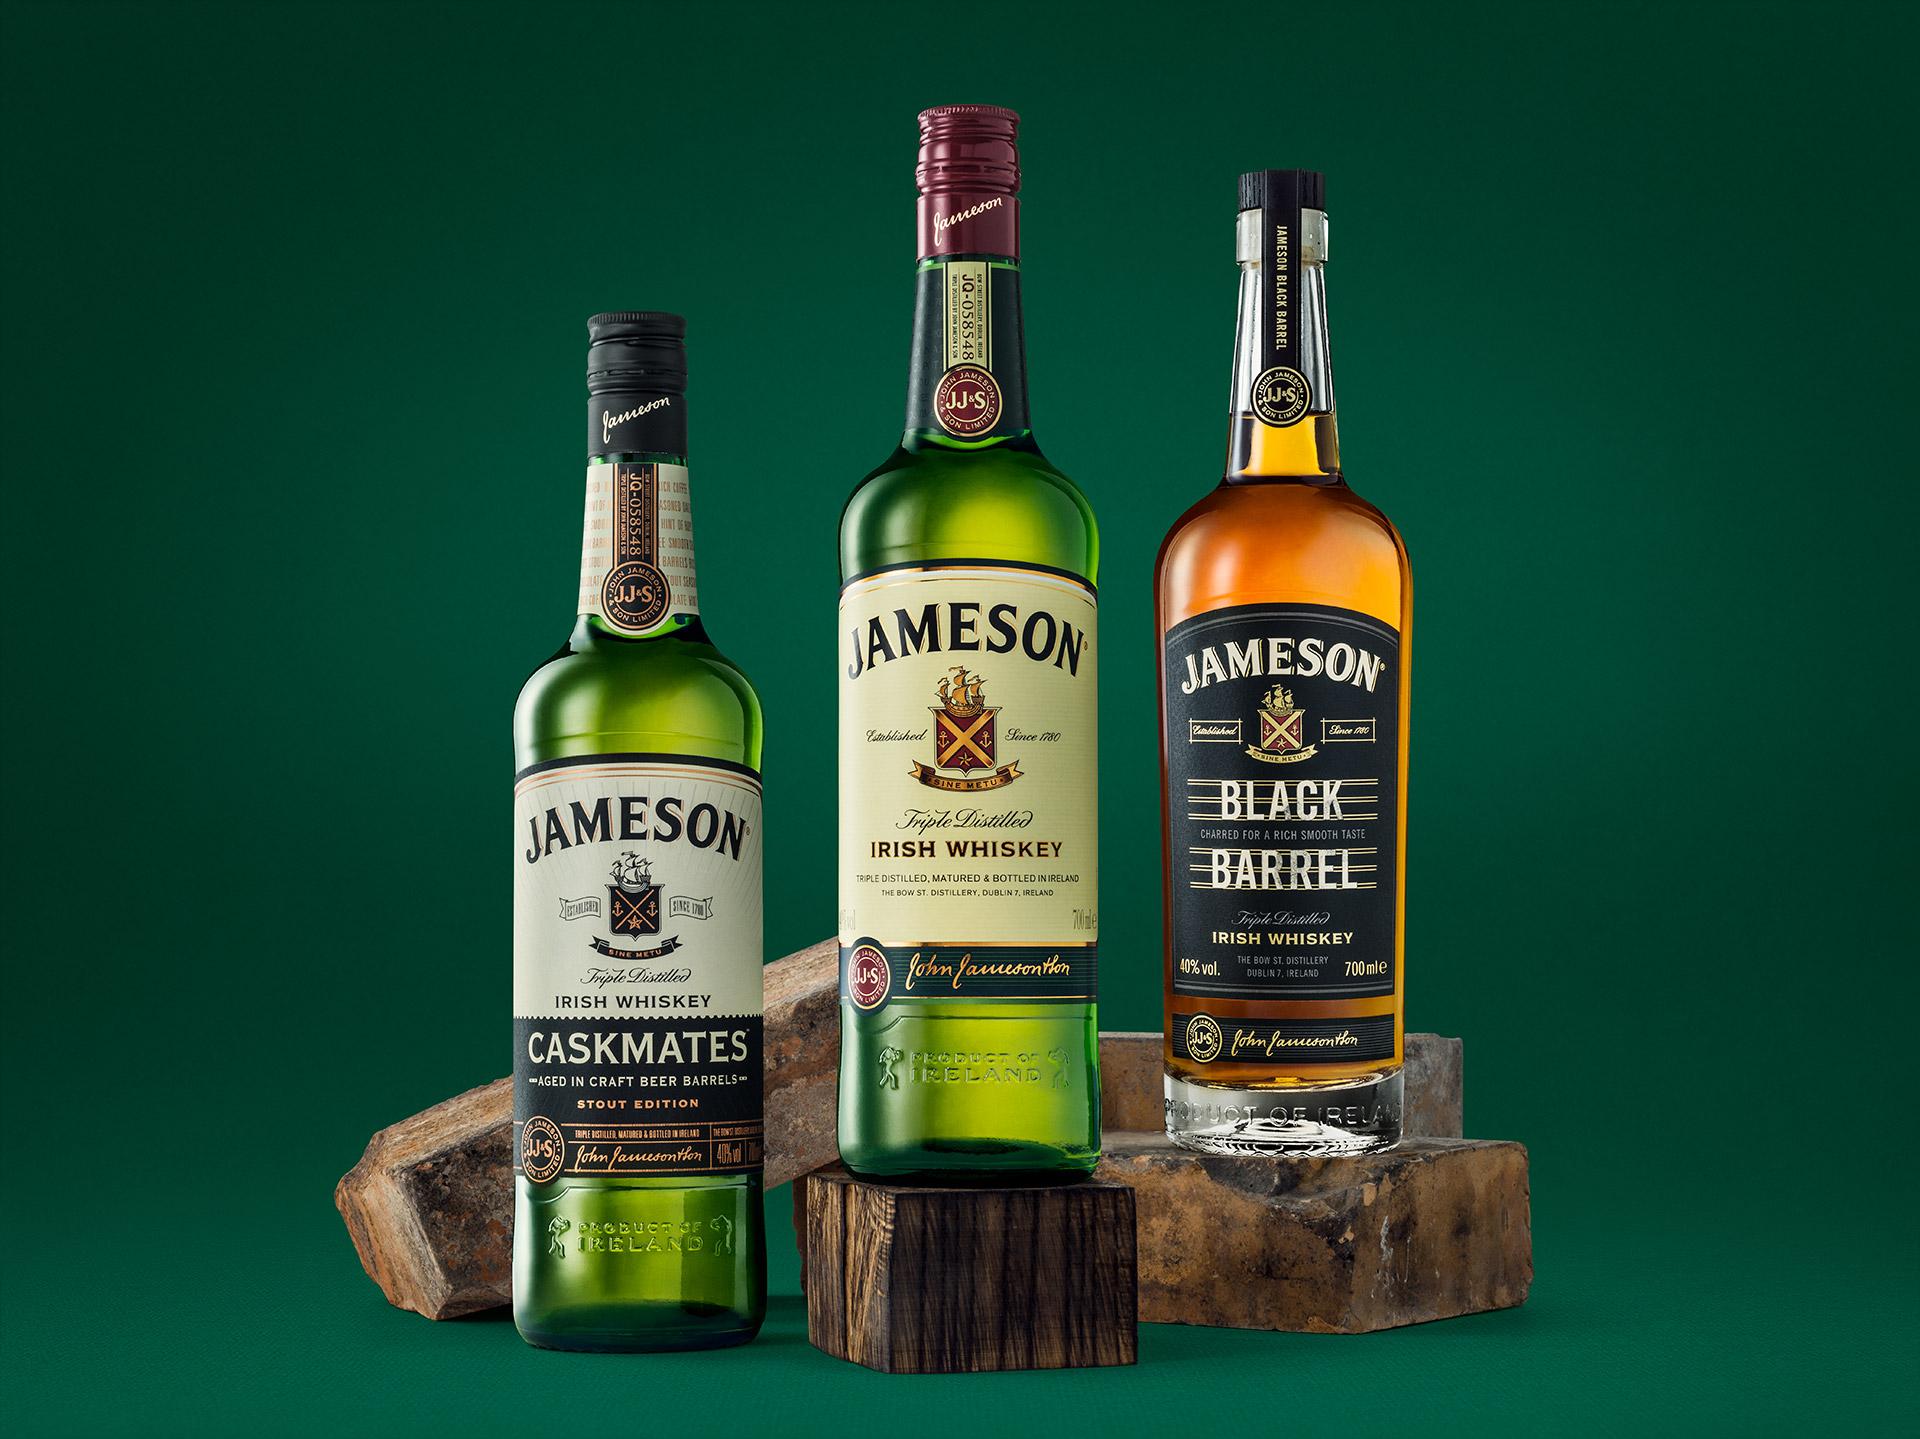 jameson_corporate_family_4_green_WEB.jpg